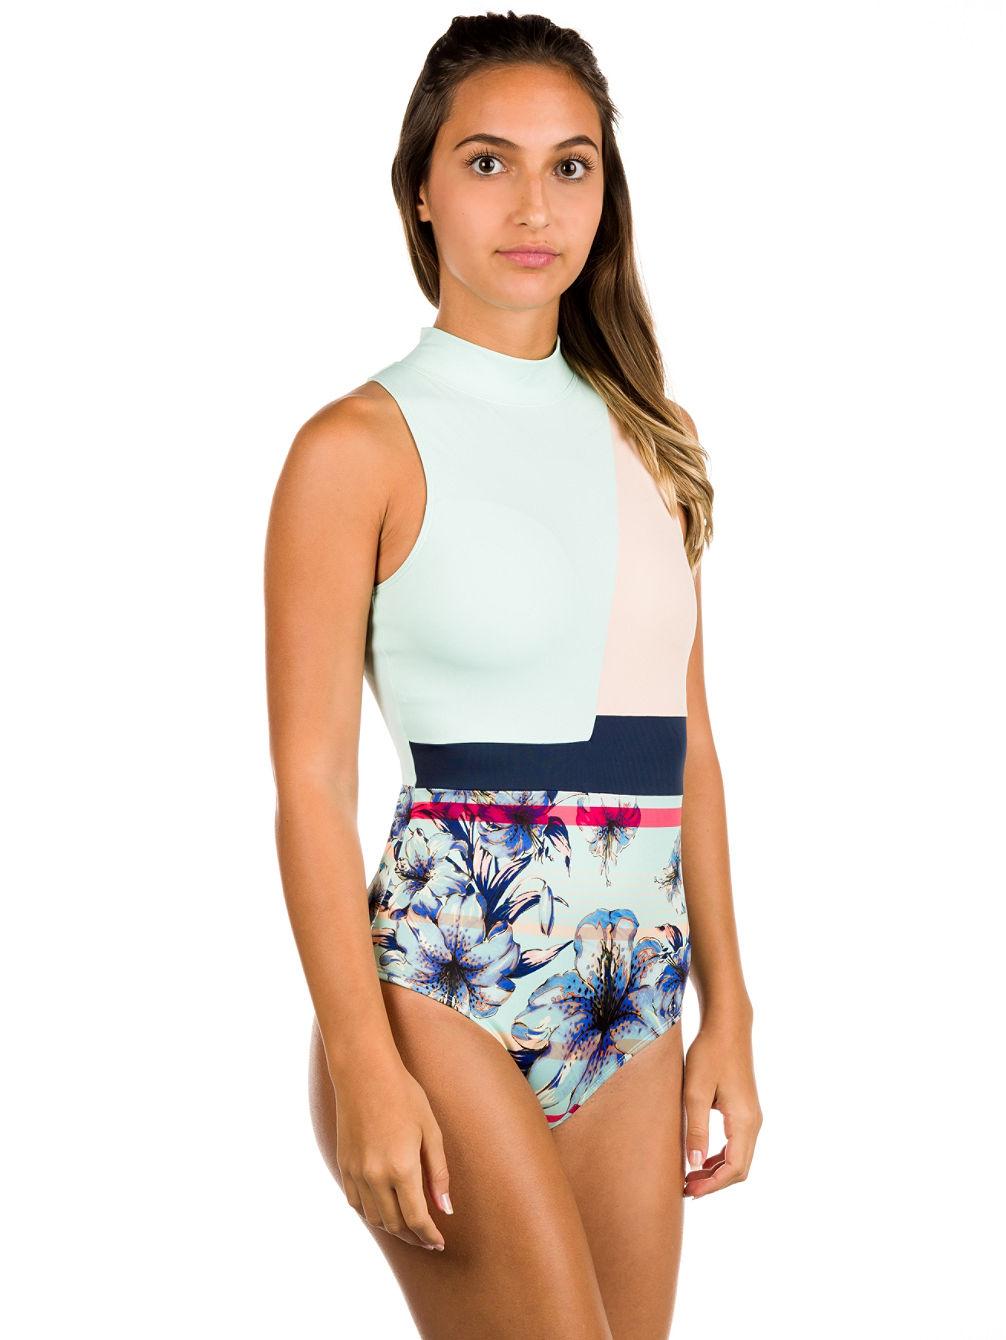 Badpak Fashion.Roxy Pop Surf Fashion Badpak Online Kopen Bij Blue Tomato